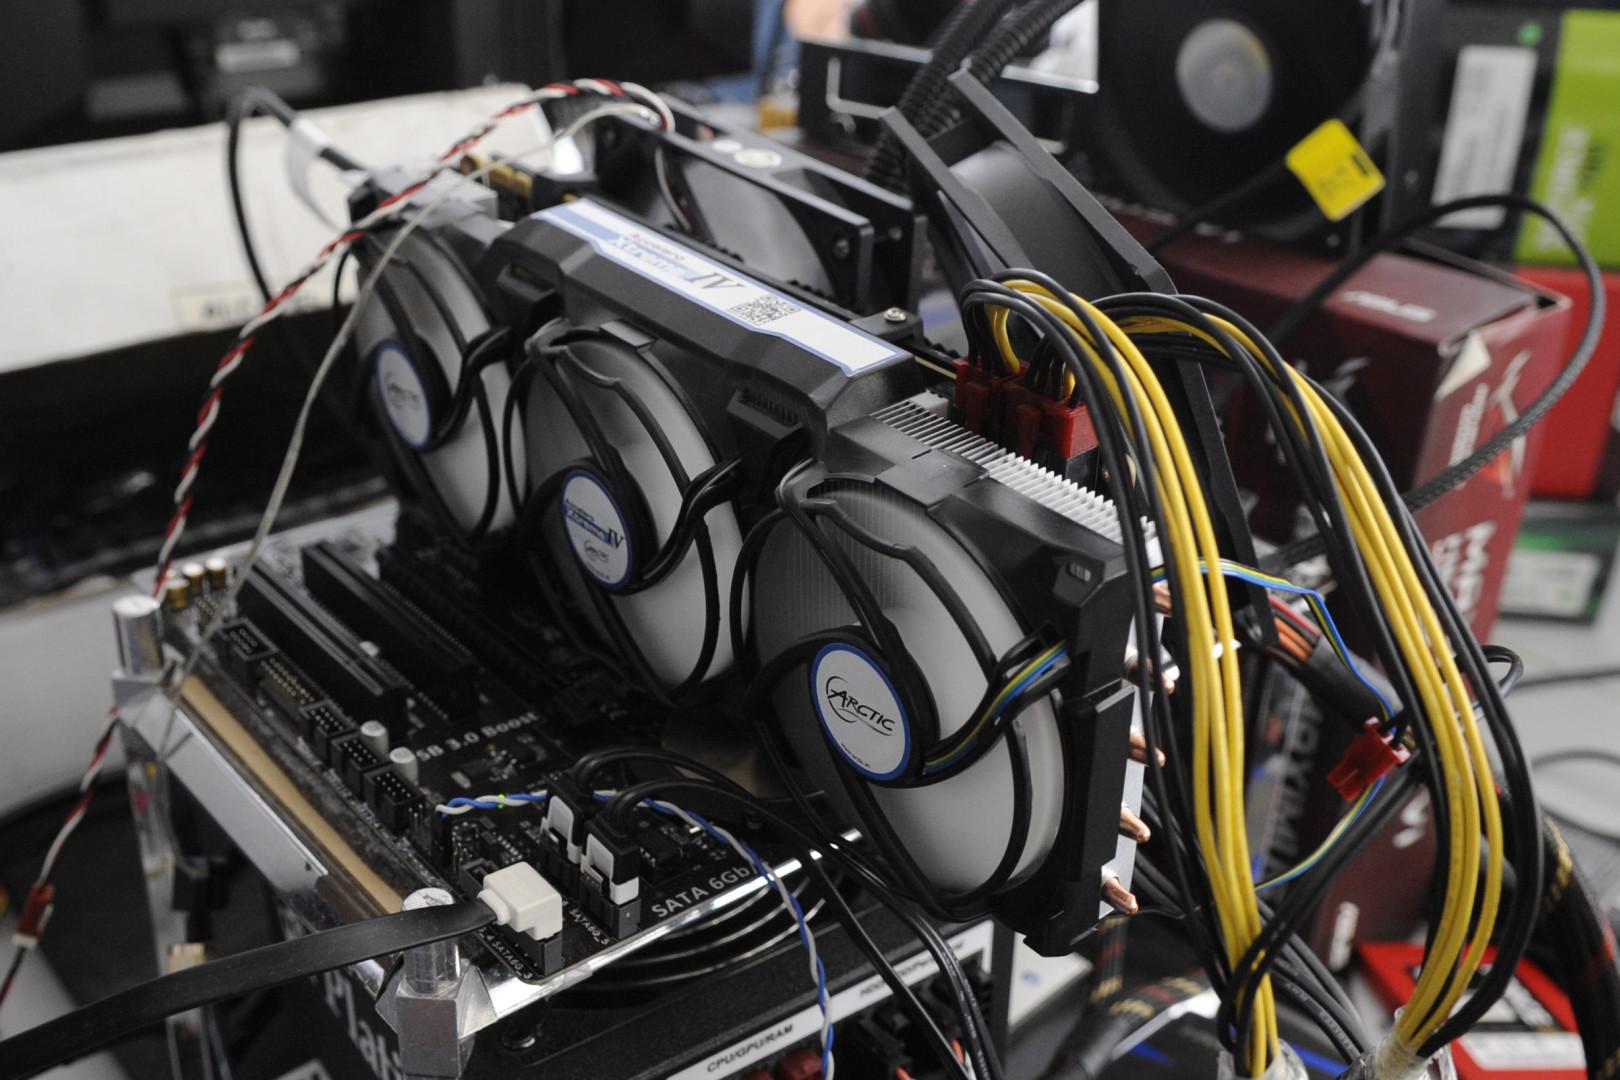 NVIDIA GeForce GTX Titan X Coupled With ARCTIC Accelero Xtreme IV